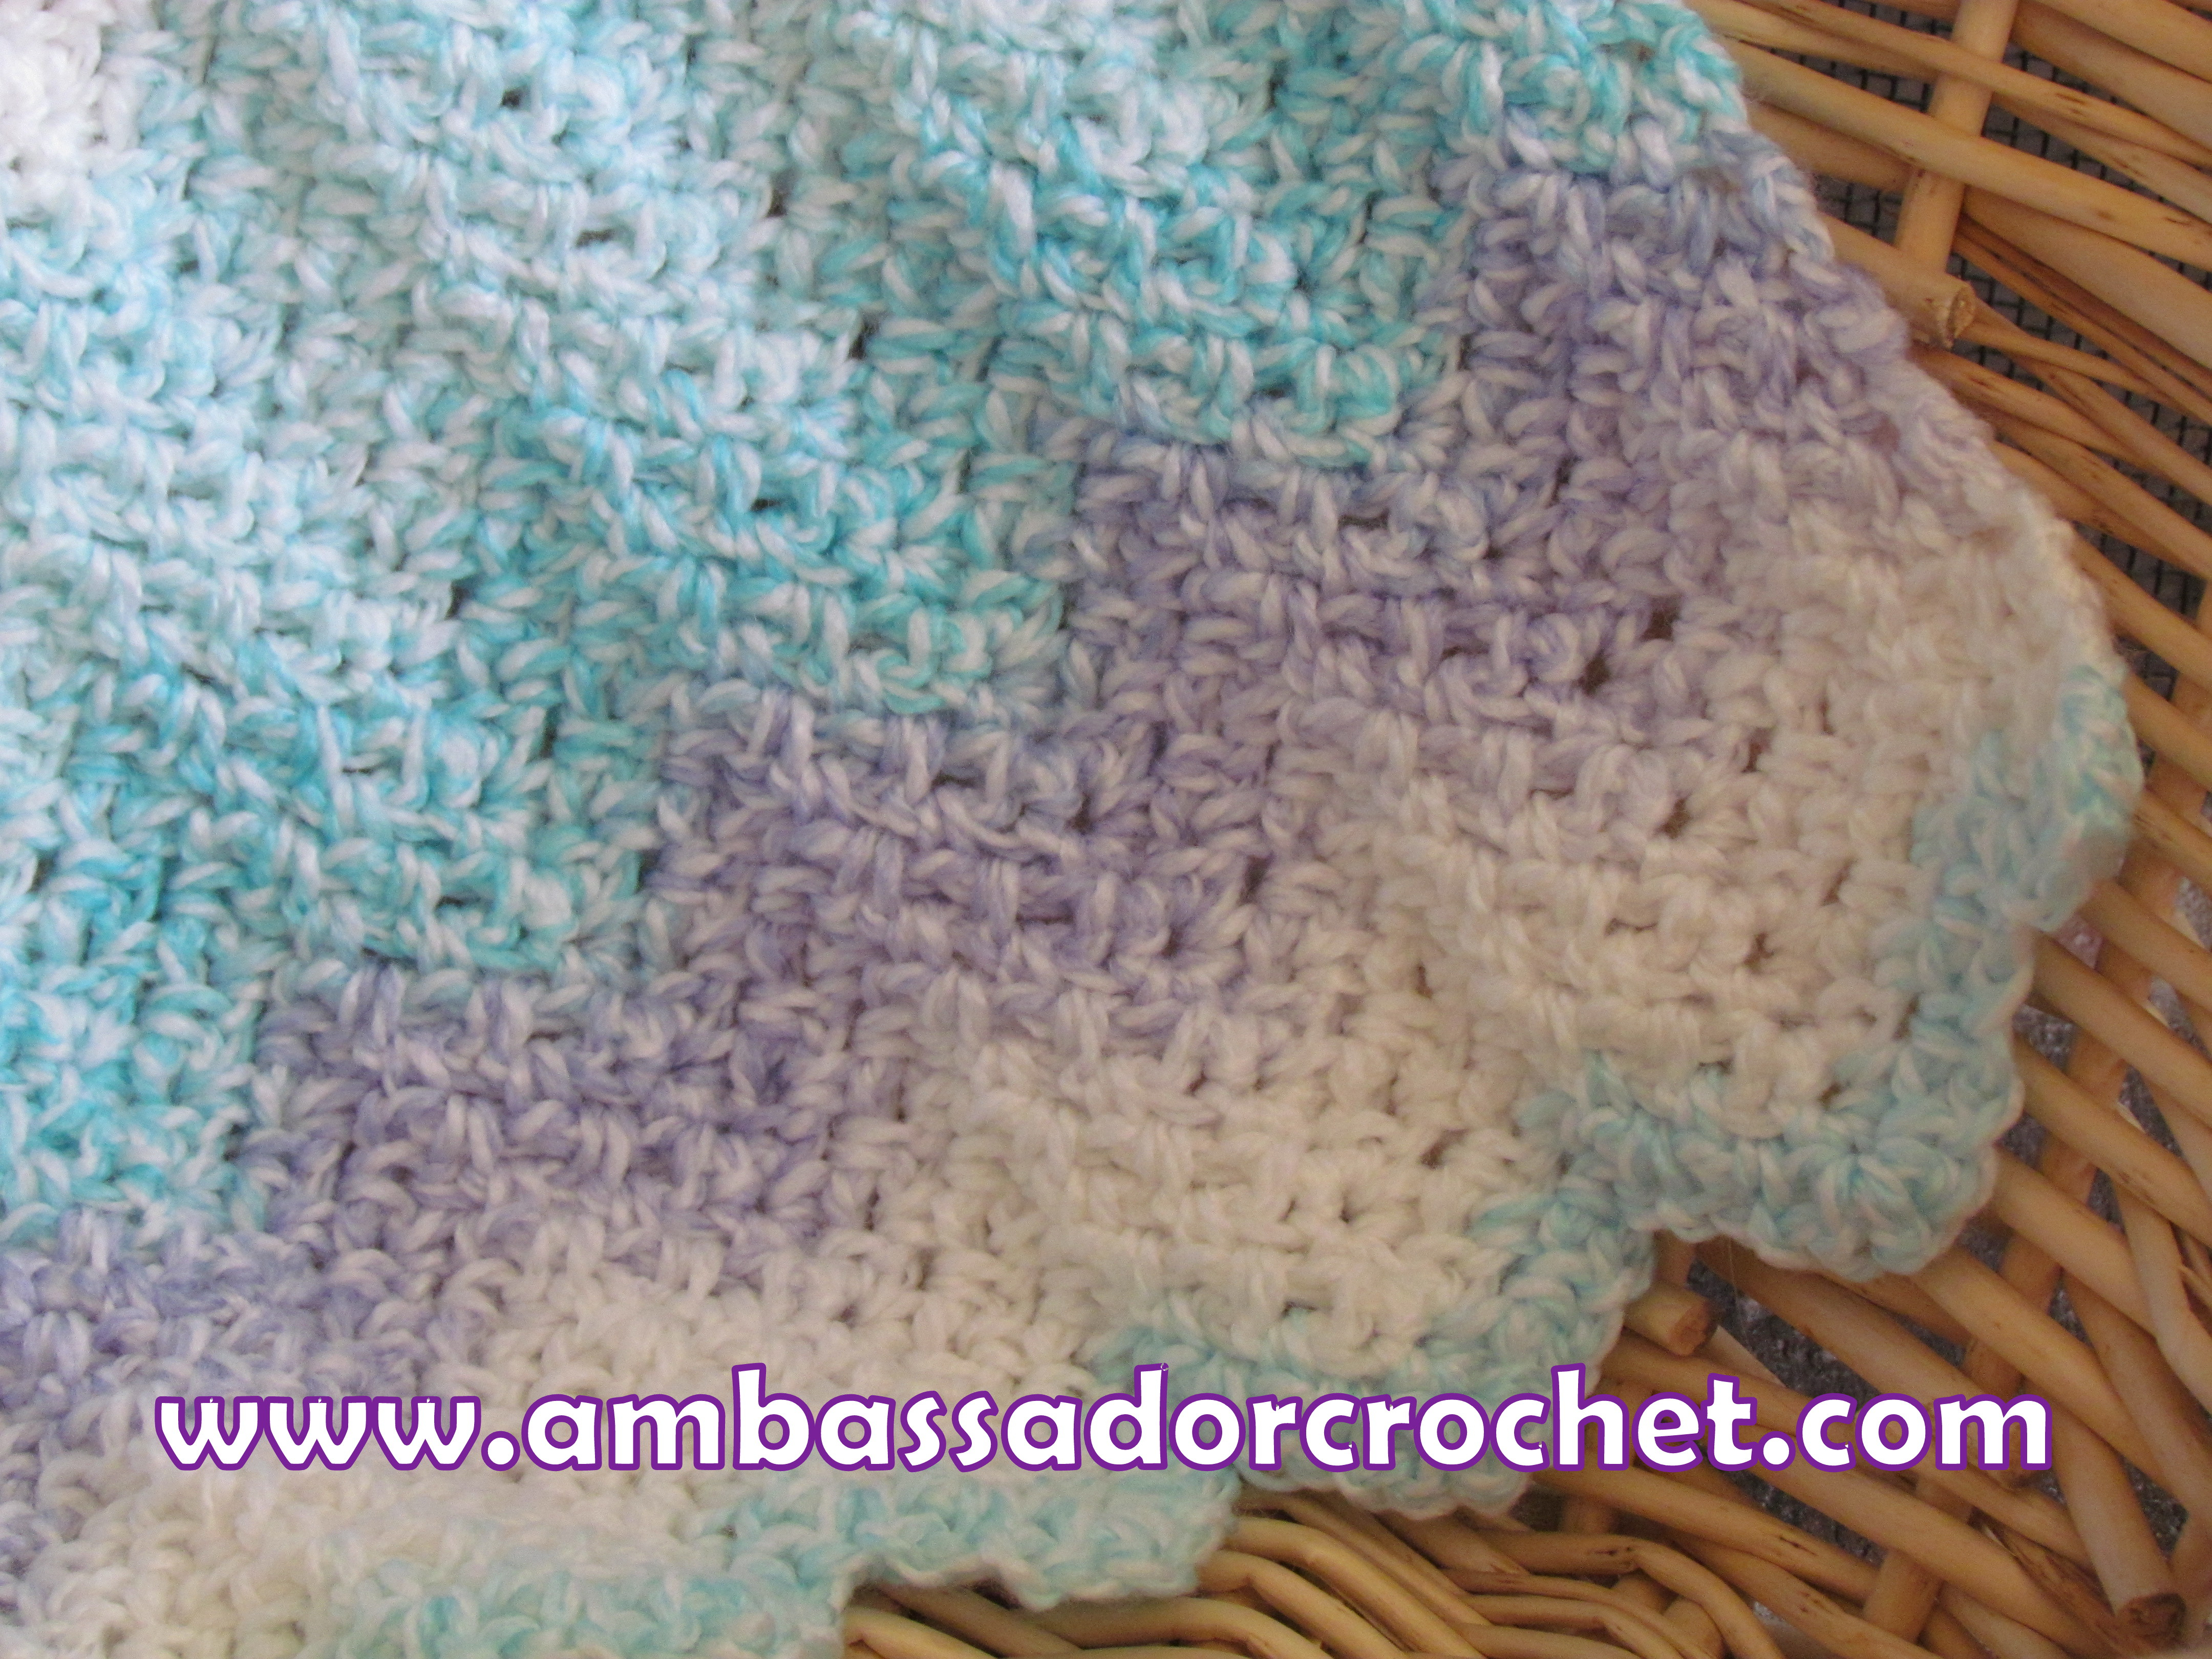 Crochet Chevron Baby Blanket Free Pattern Sleep Well With Free Crochet Patterns For Ba Blankets Crochet Crochetnstyle Com